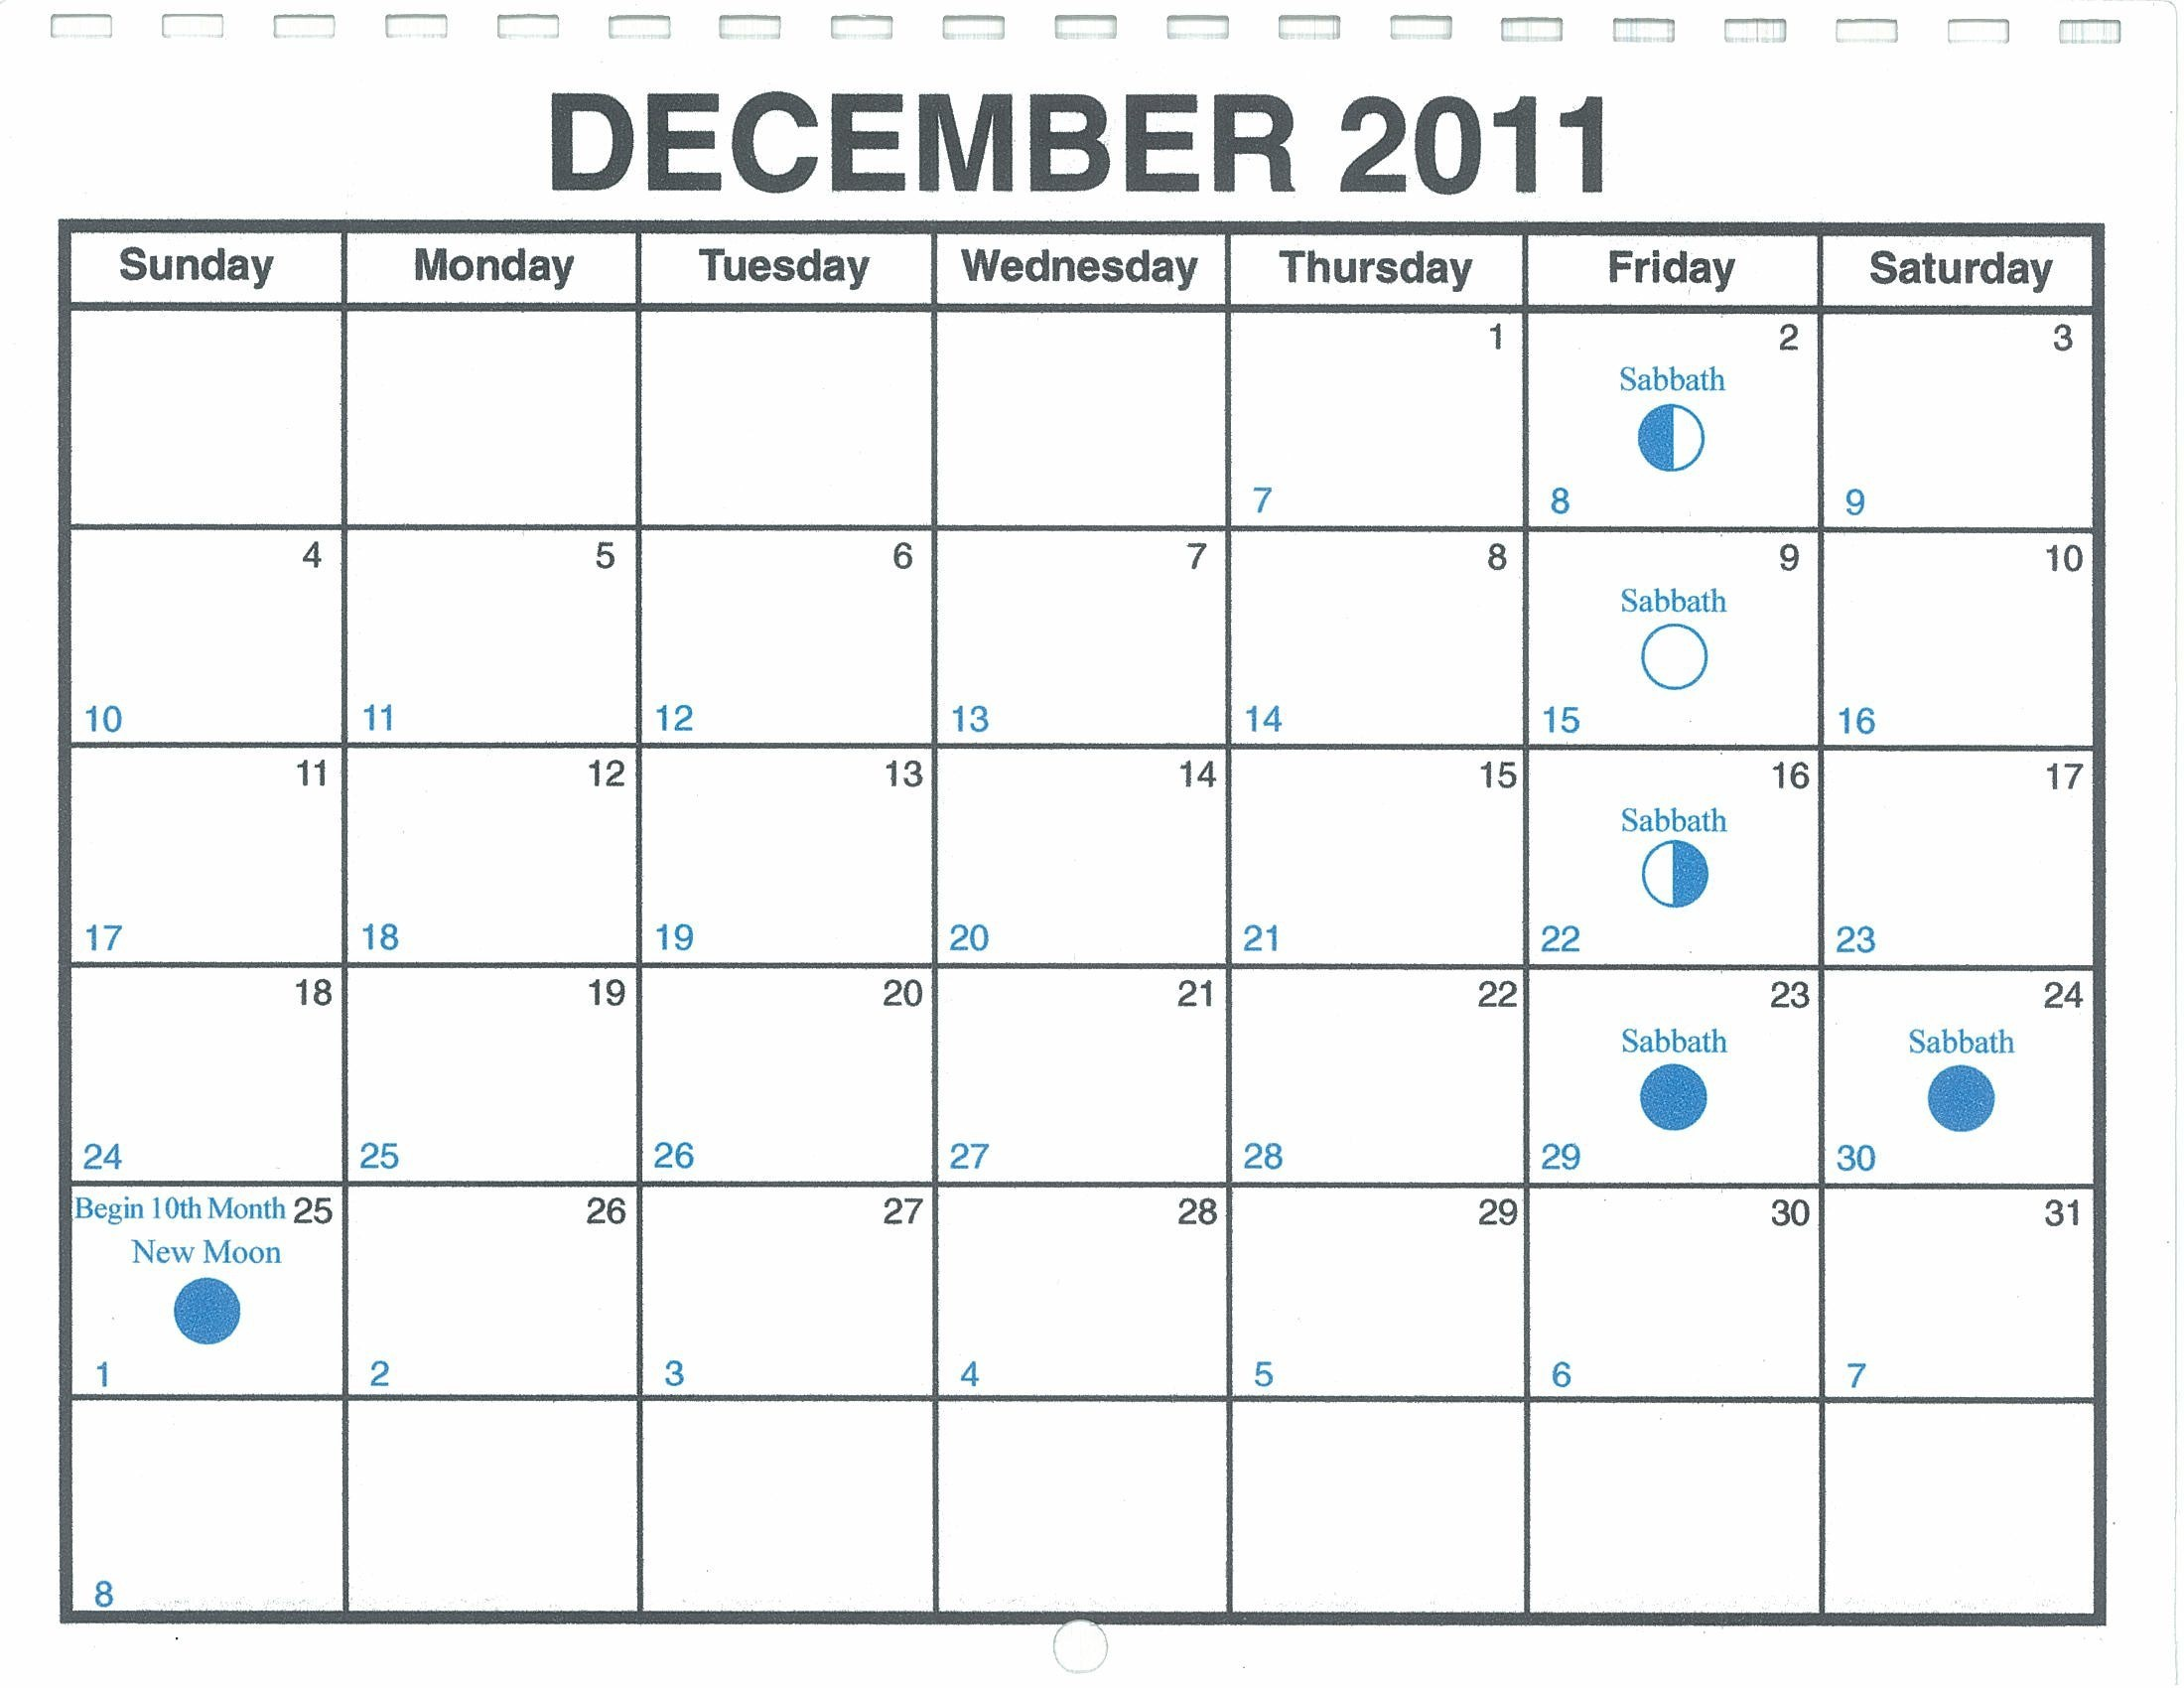 ... under articles tagged with 2011 calendar december lunar calendar moon